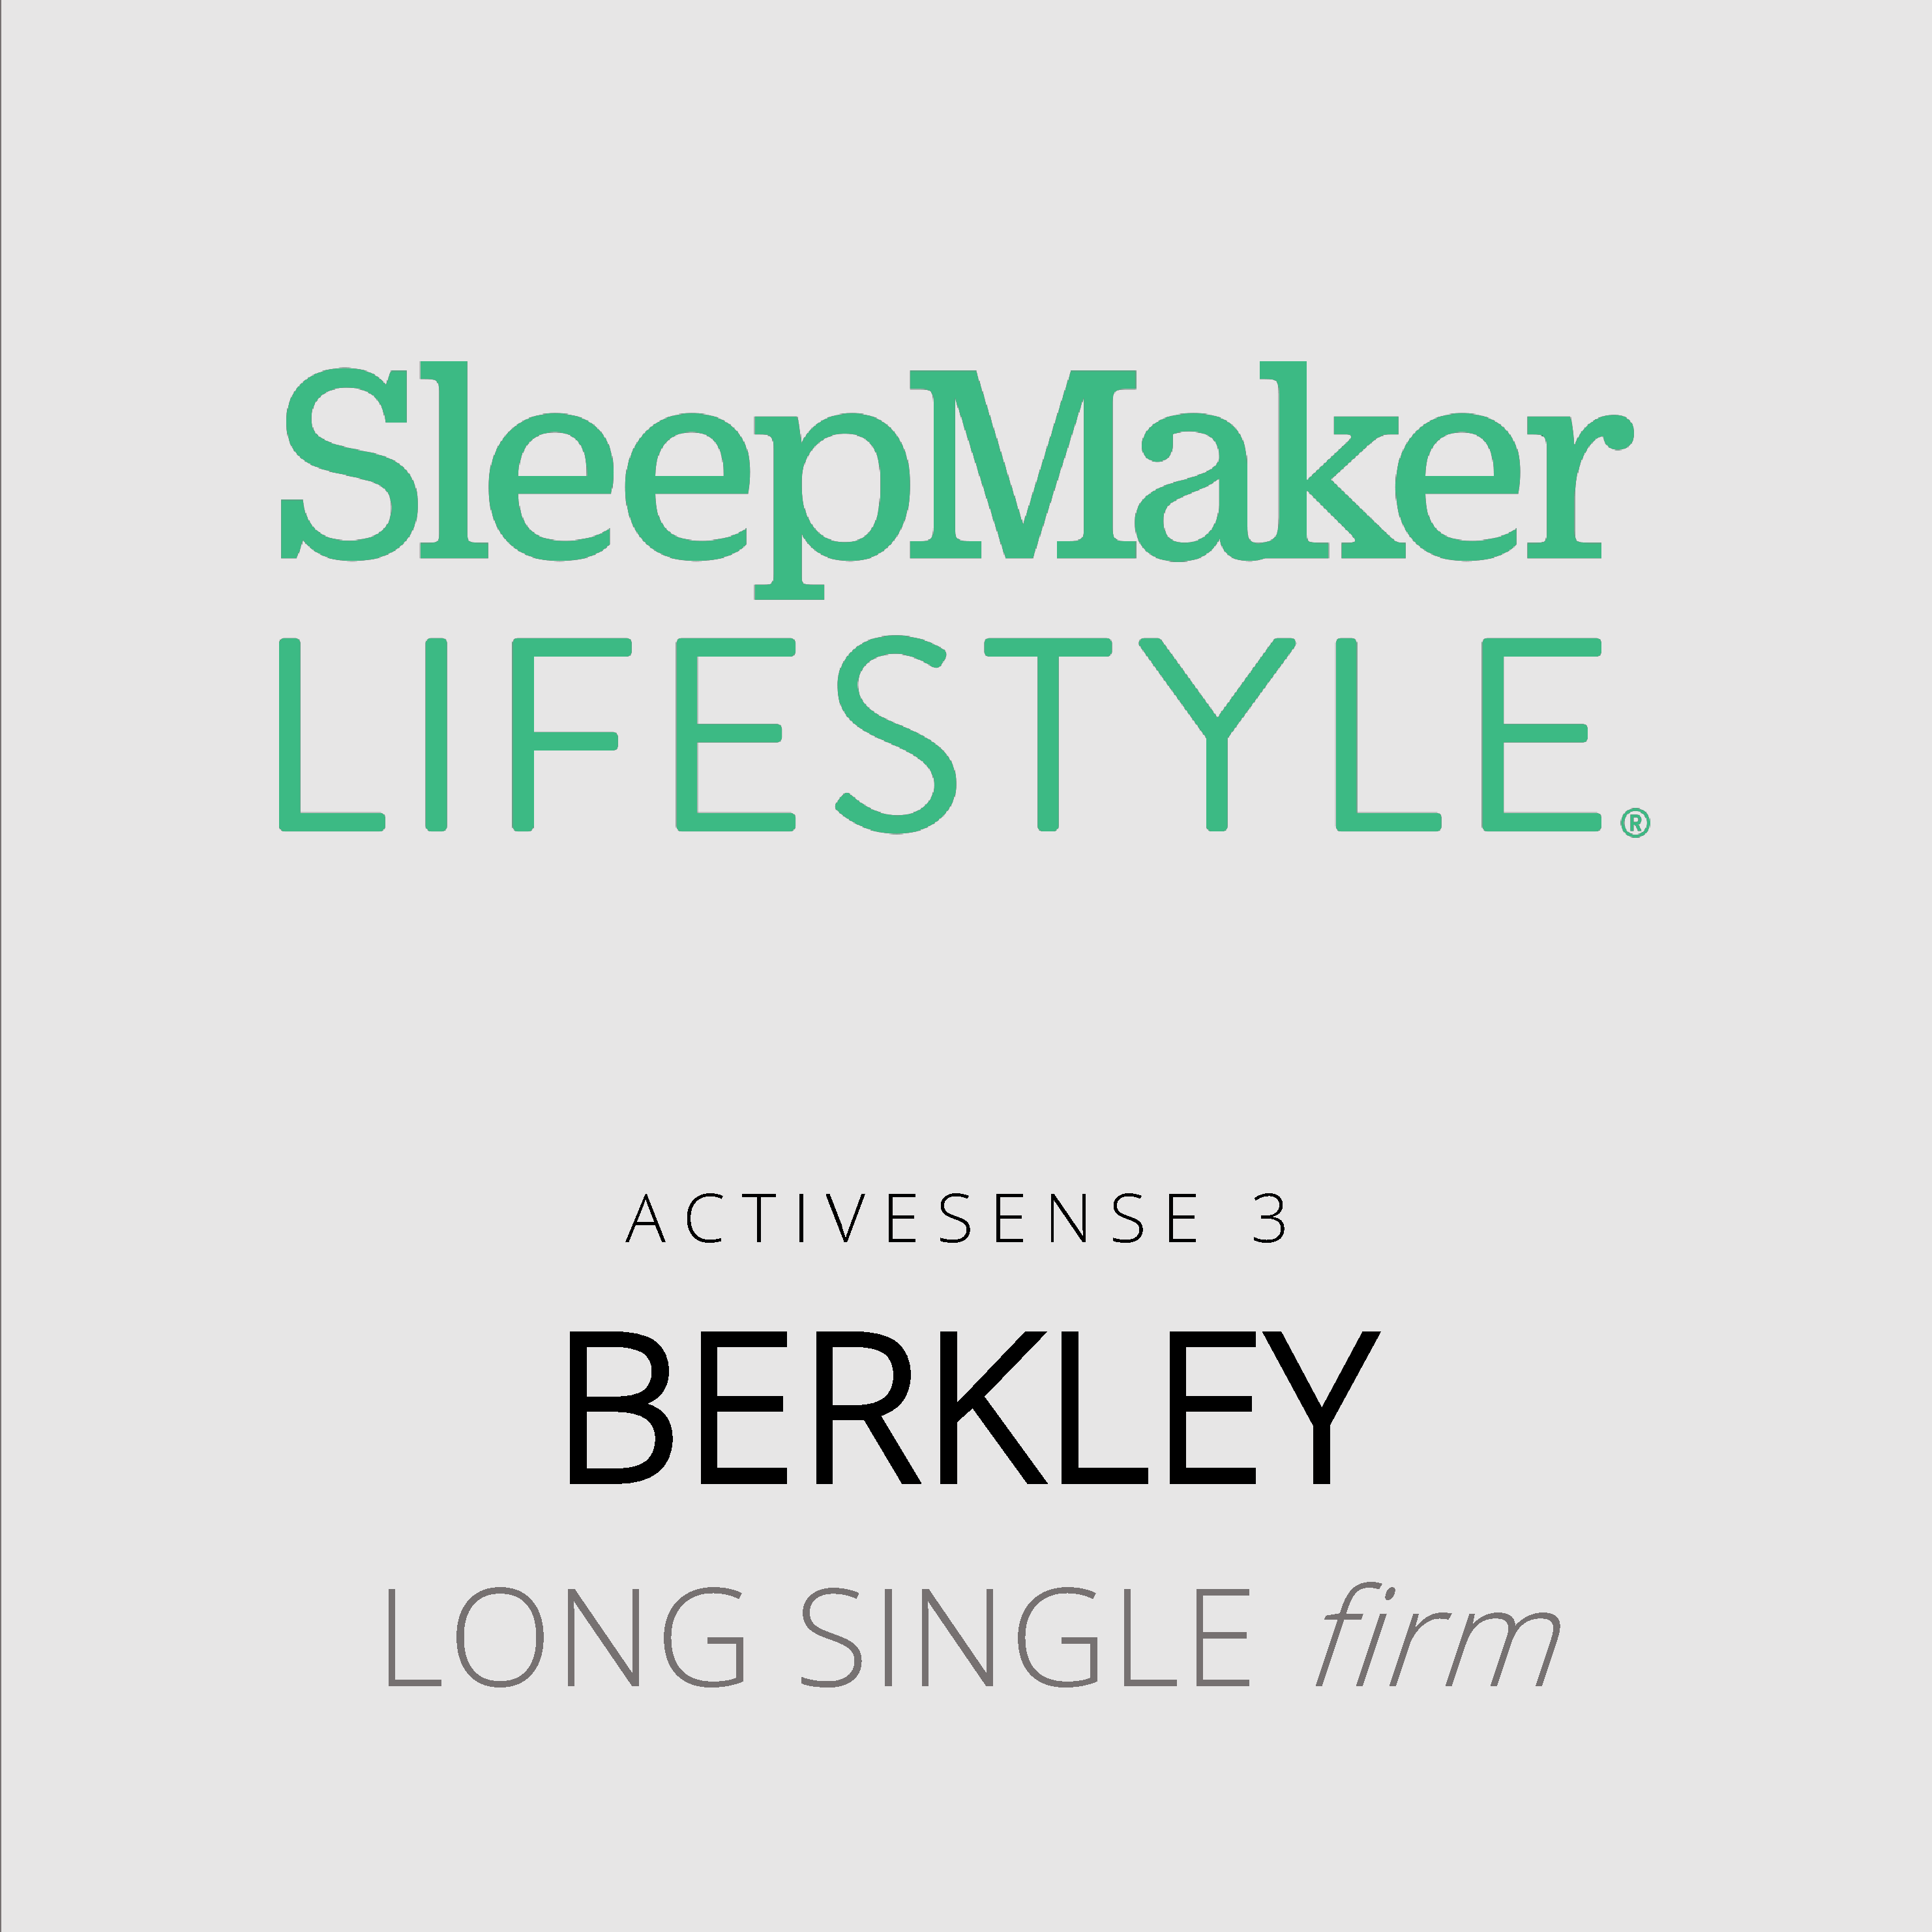 SleepMaker Lifestyle – Berkley – ActiveSense 3 – Long Single Firm Mattress